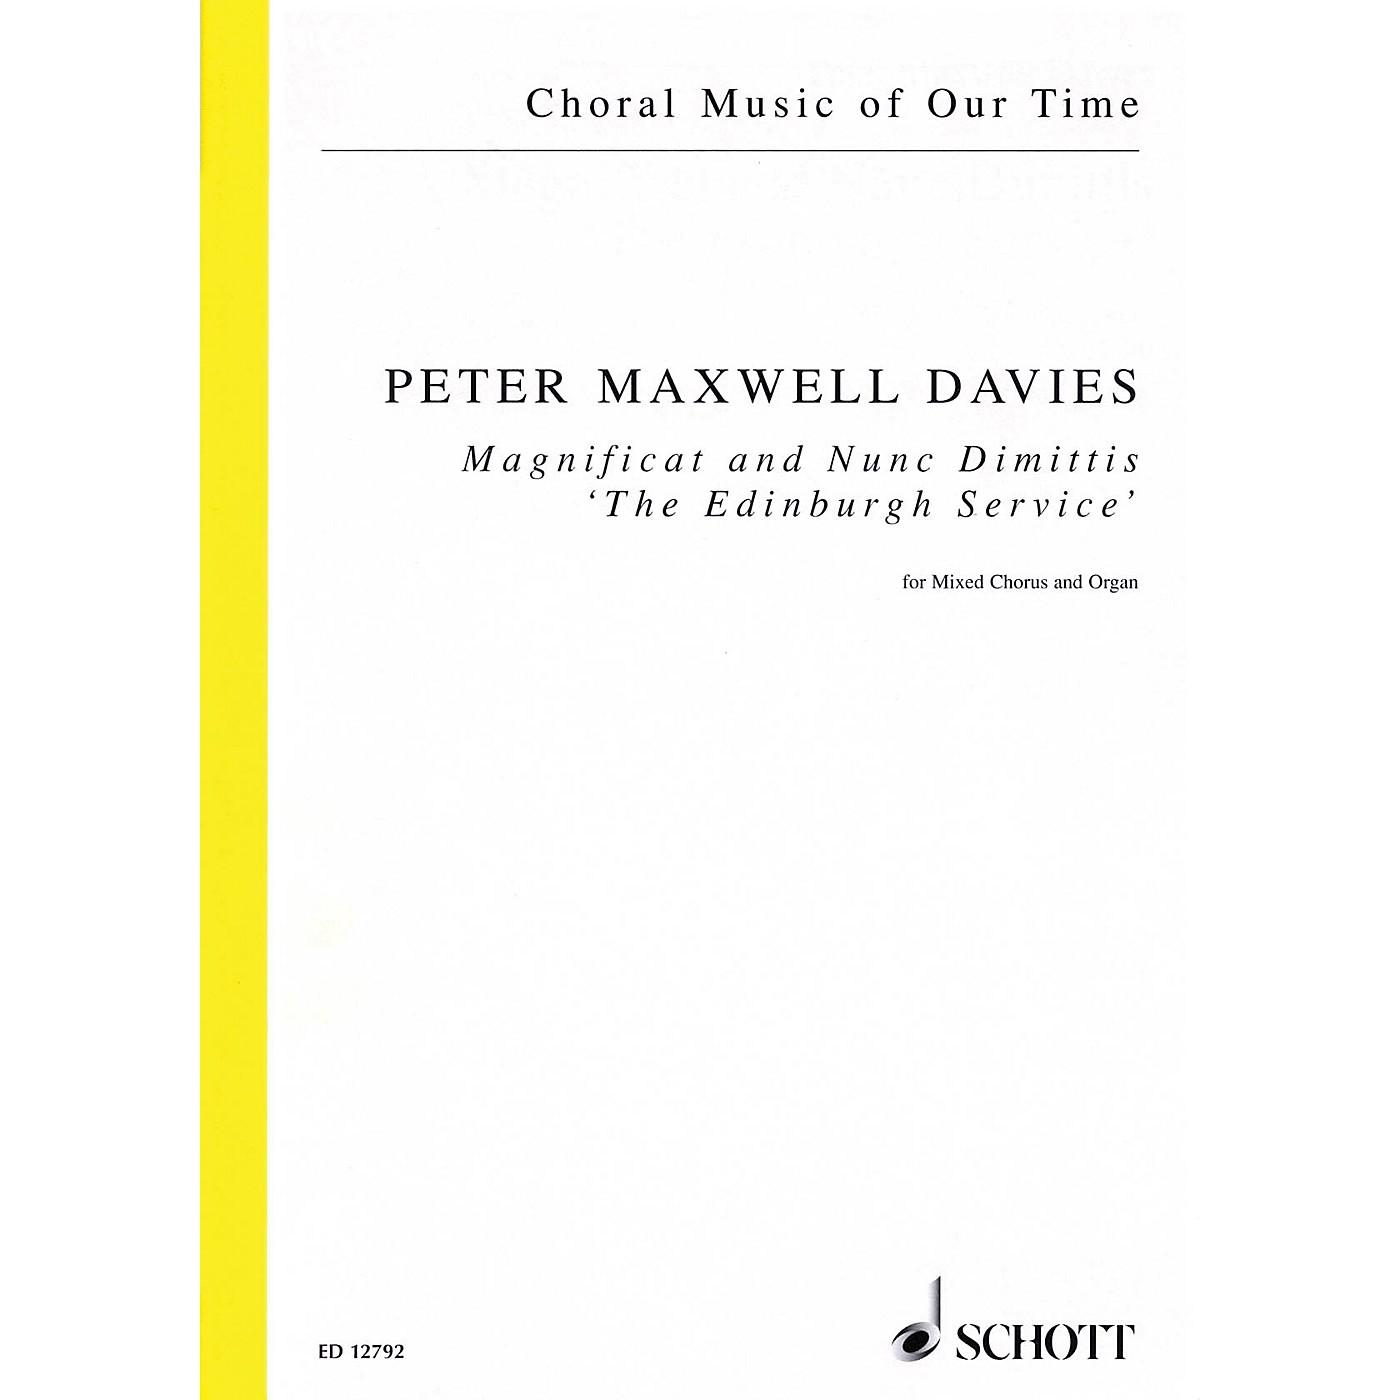 Schott Magnificat and Nunc Dimittis The Edinburgh Service (SATB and Organ) Vocal Score by Peter Maxwell Davies thumbnail